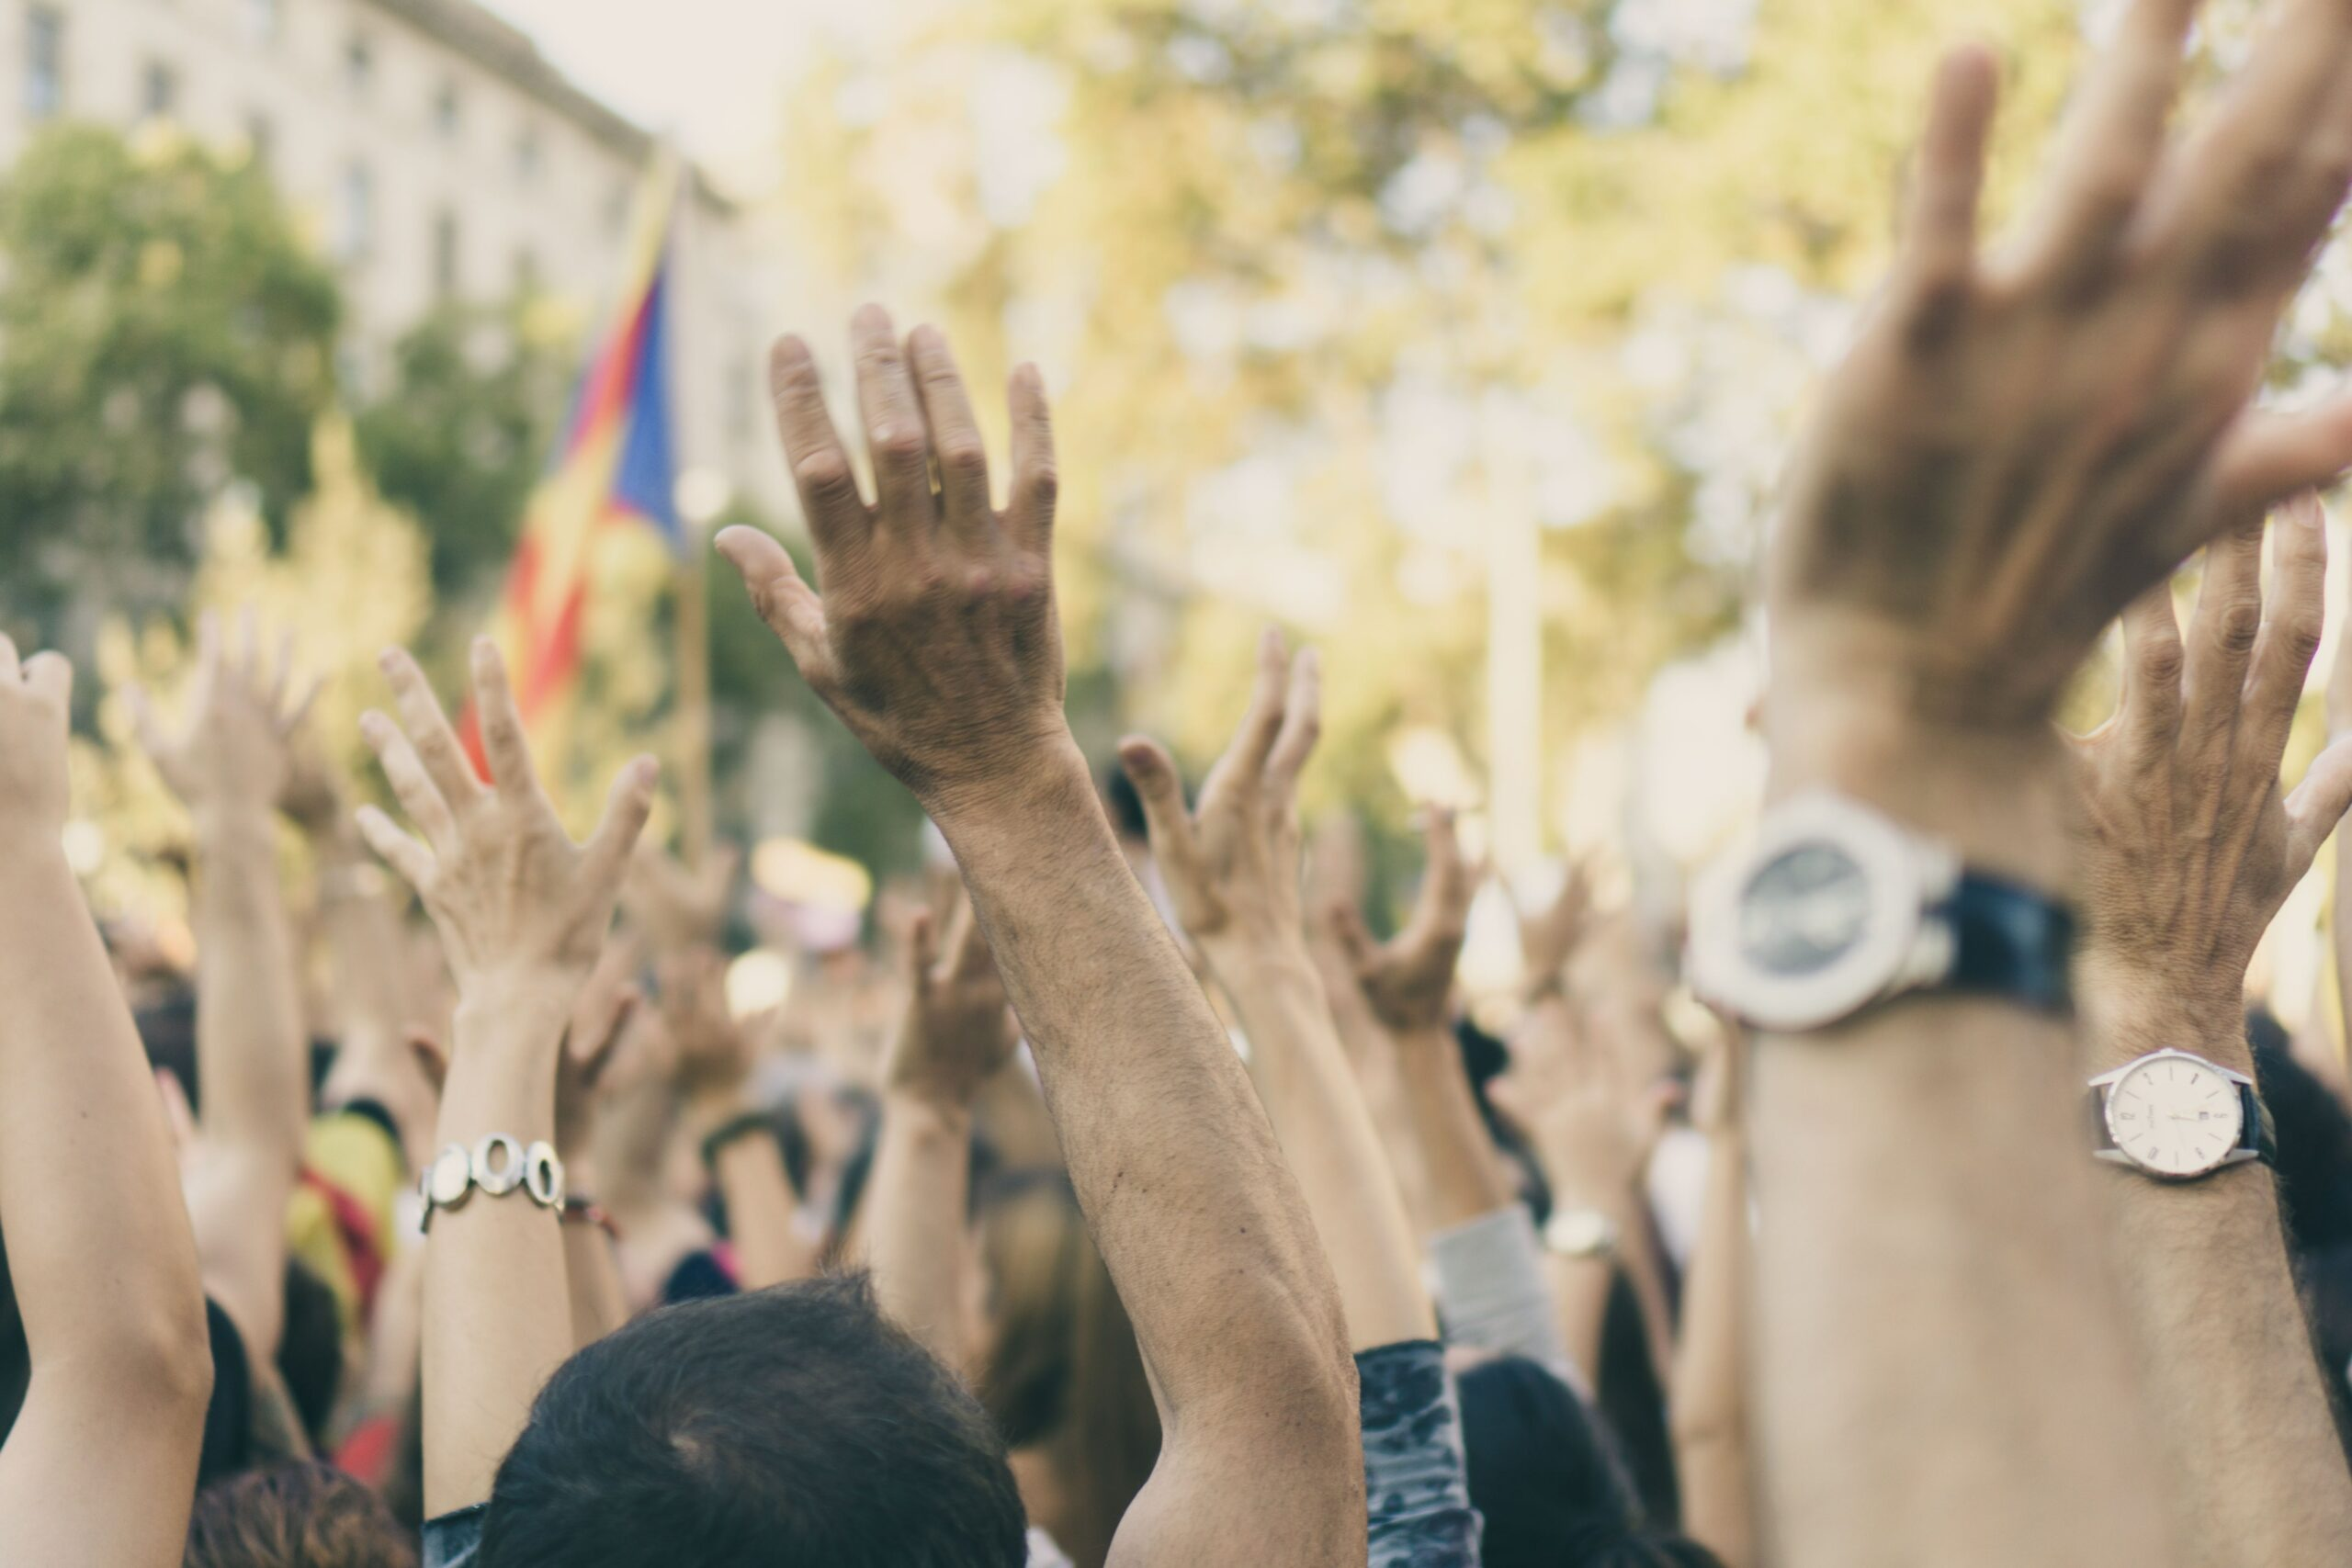 Cannabis Advocates Rally in Pennsylvania to Push Stonewalled Cannabis Legalization Legislation